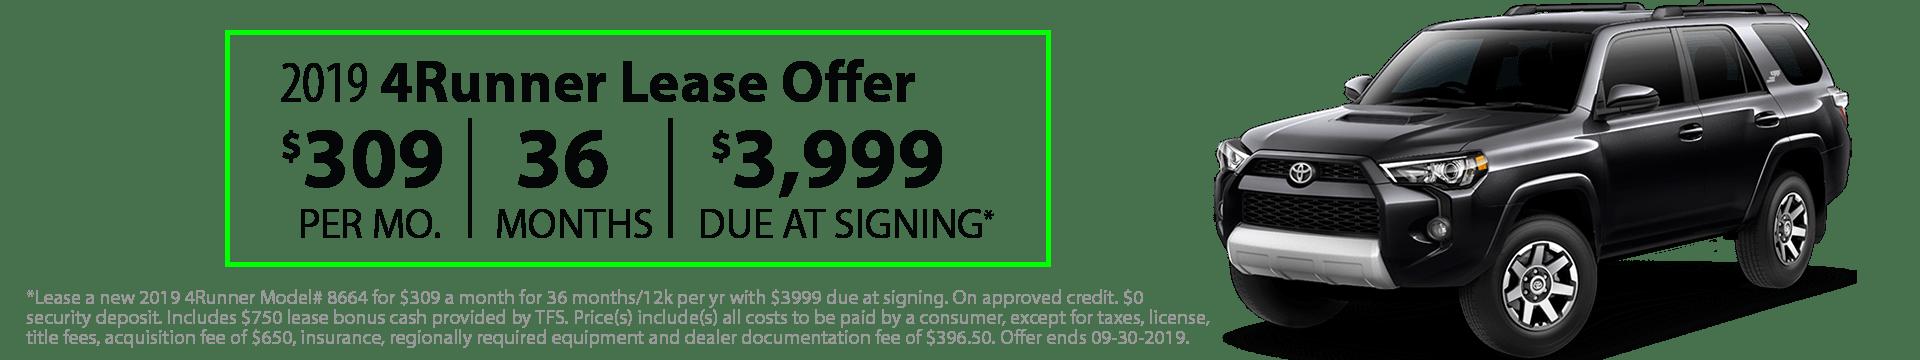 2019 4Runner Special Lease Offer